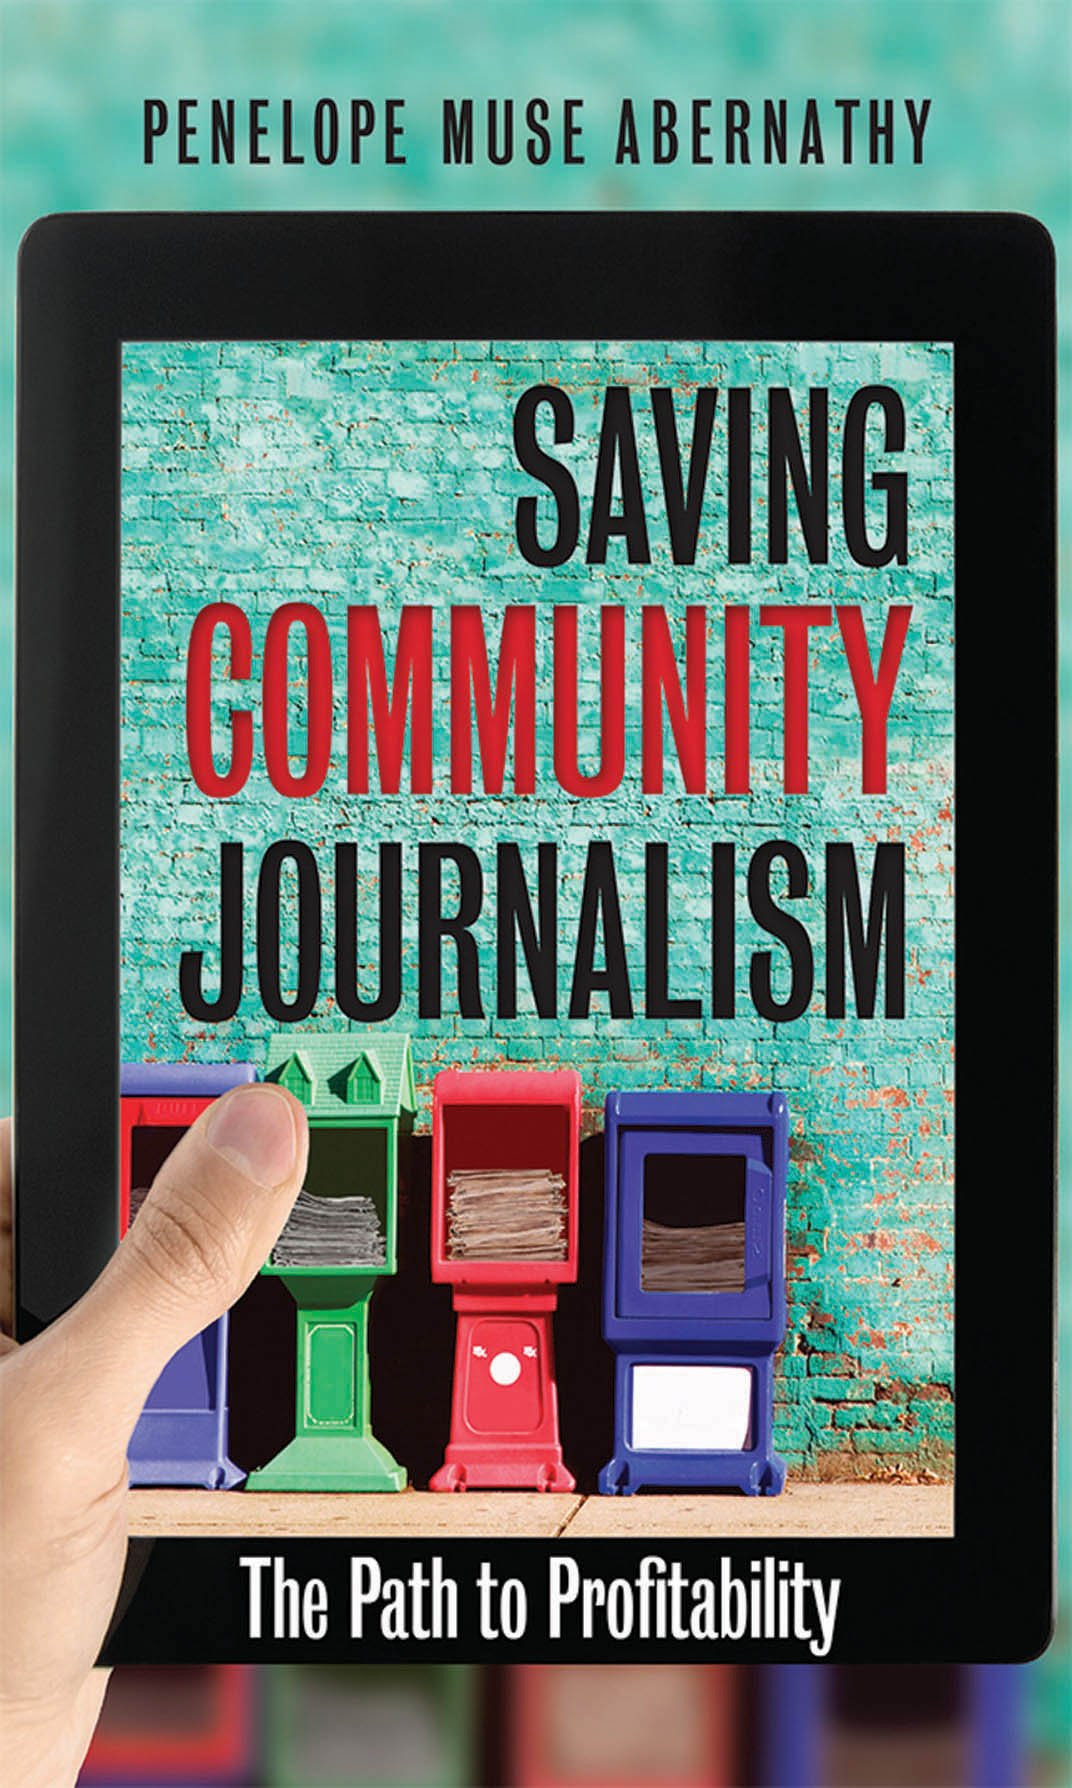 Saving Community Journalism: The Path to Profitability by The University of North Carolina Press